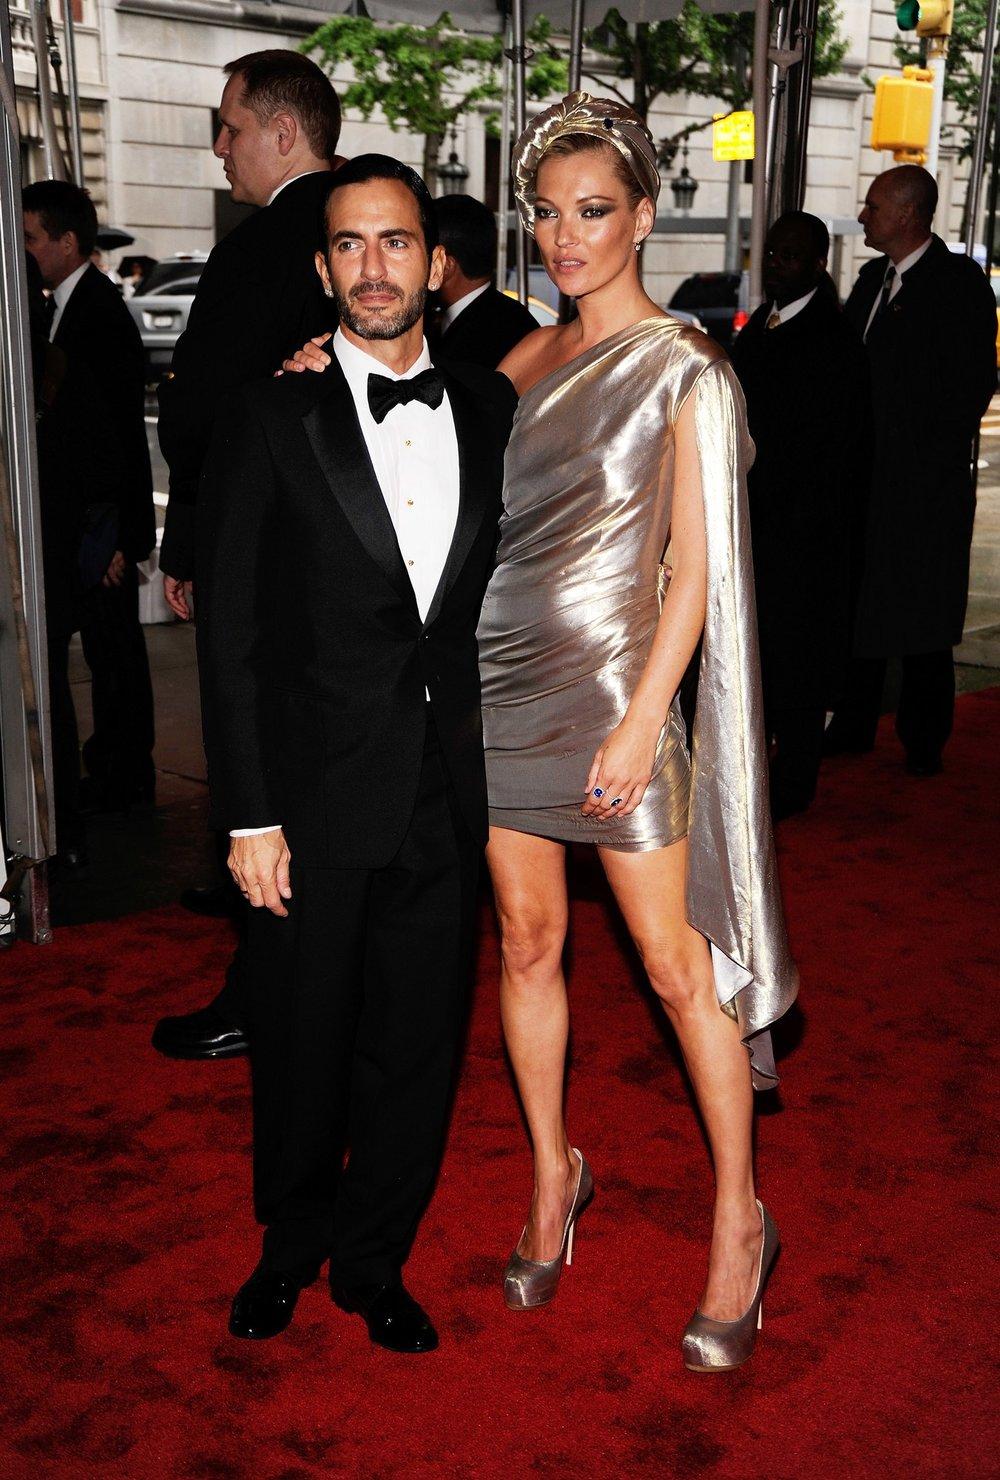 Kate Moss 2009 Marc Jacobs.jpg